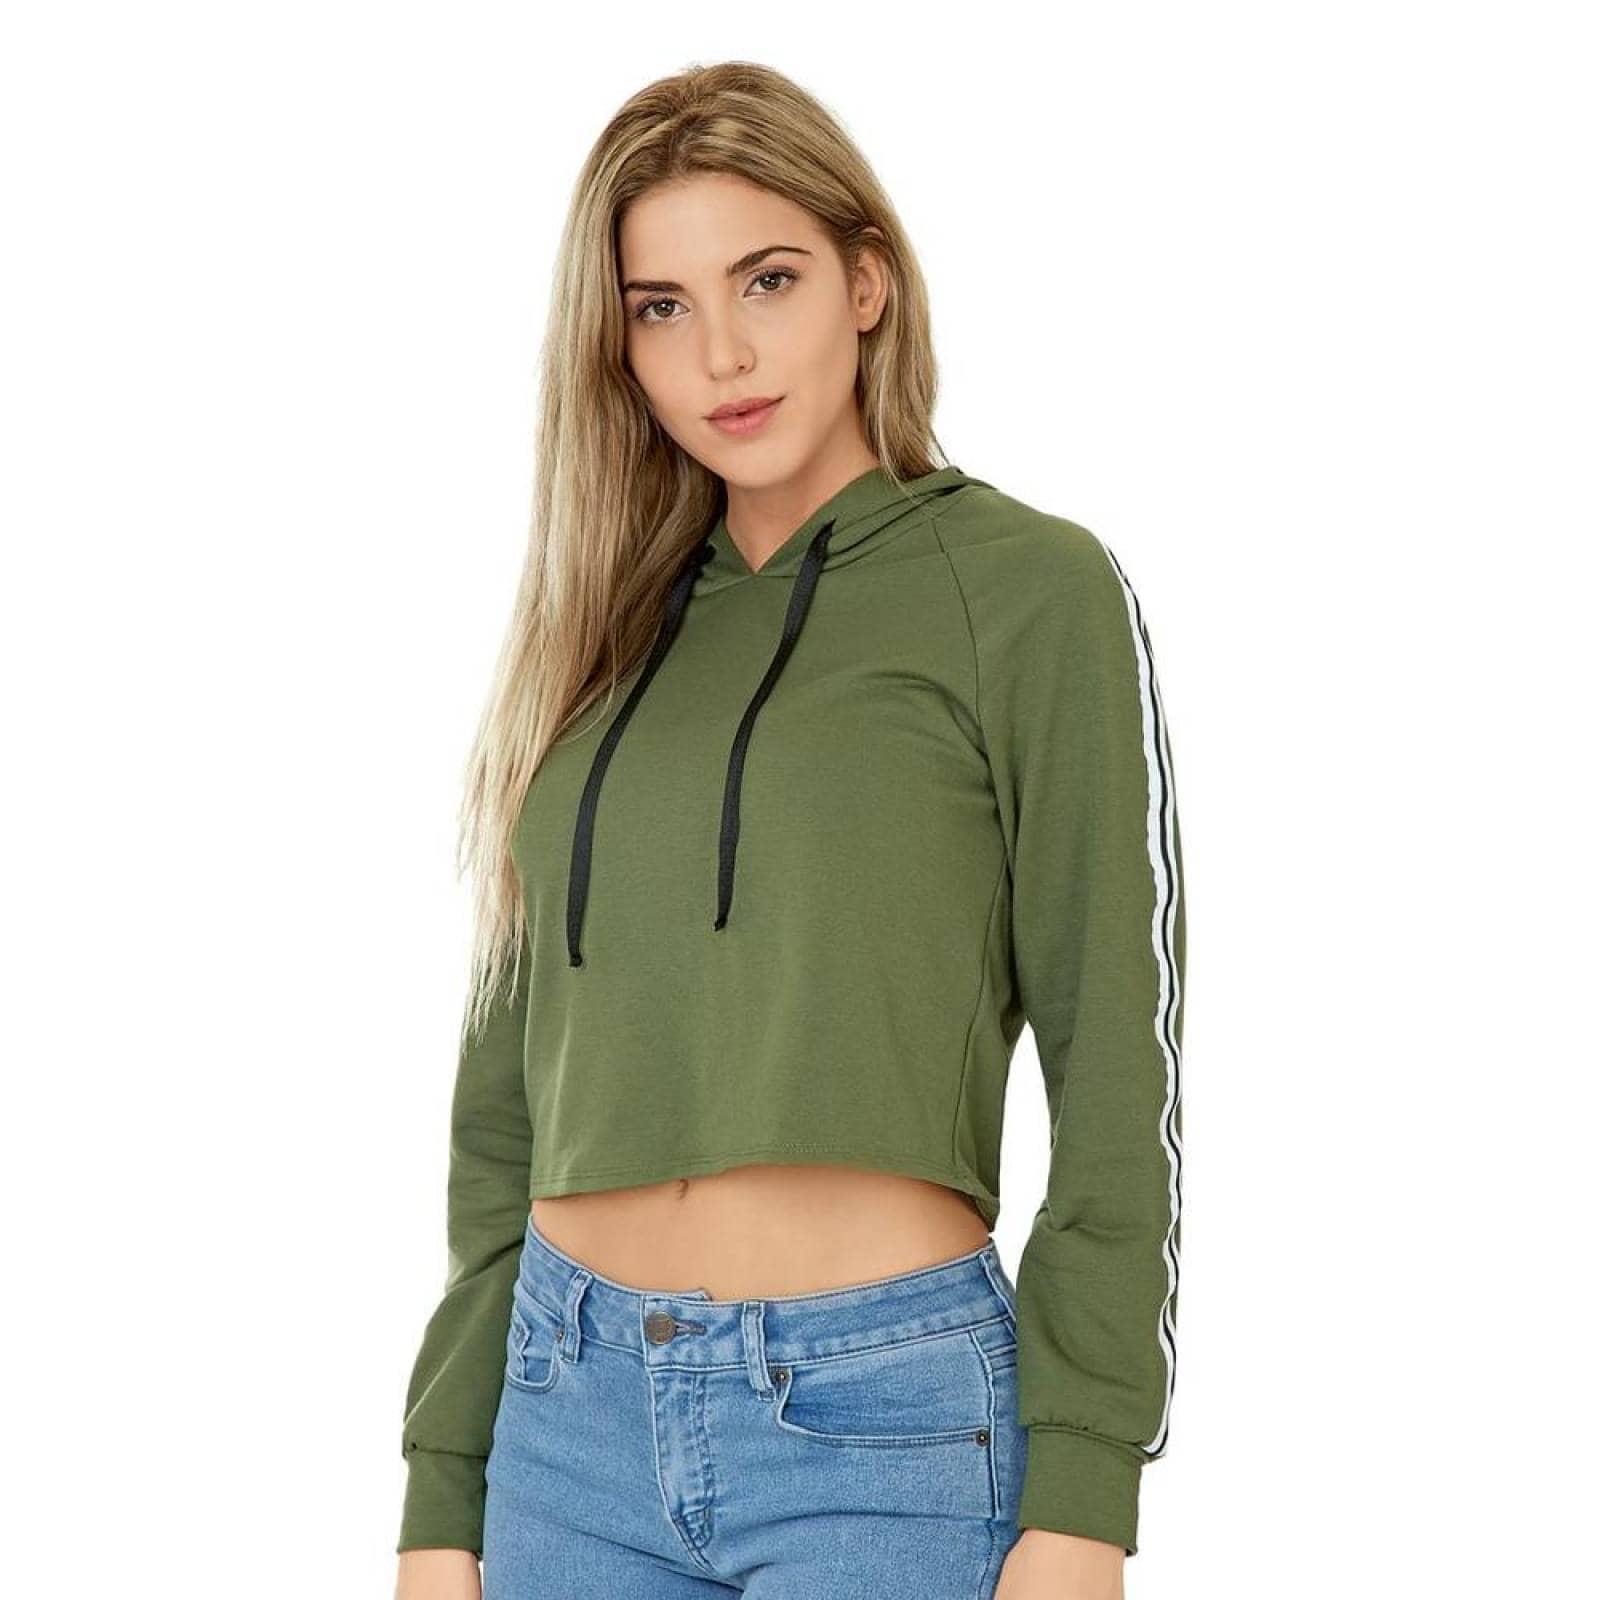 Sudadera Personality Mujer Verde AlgodonPoliester 2302